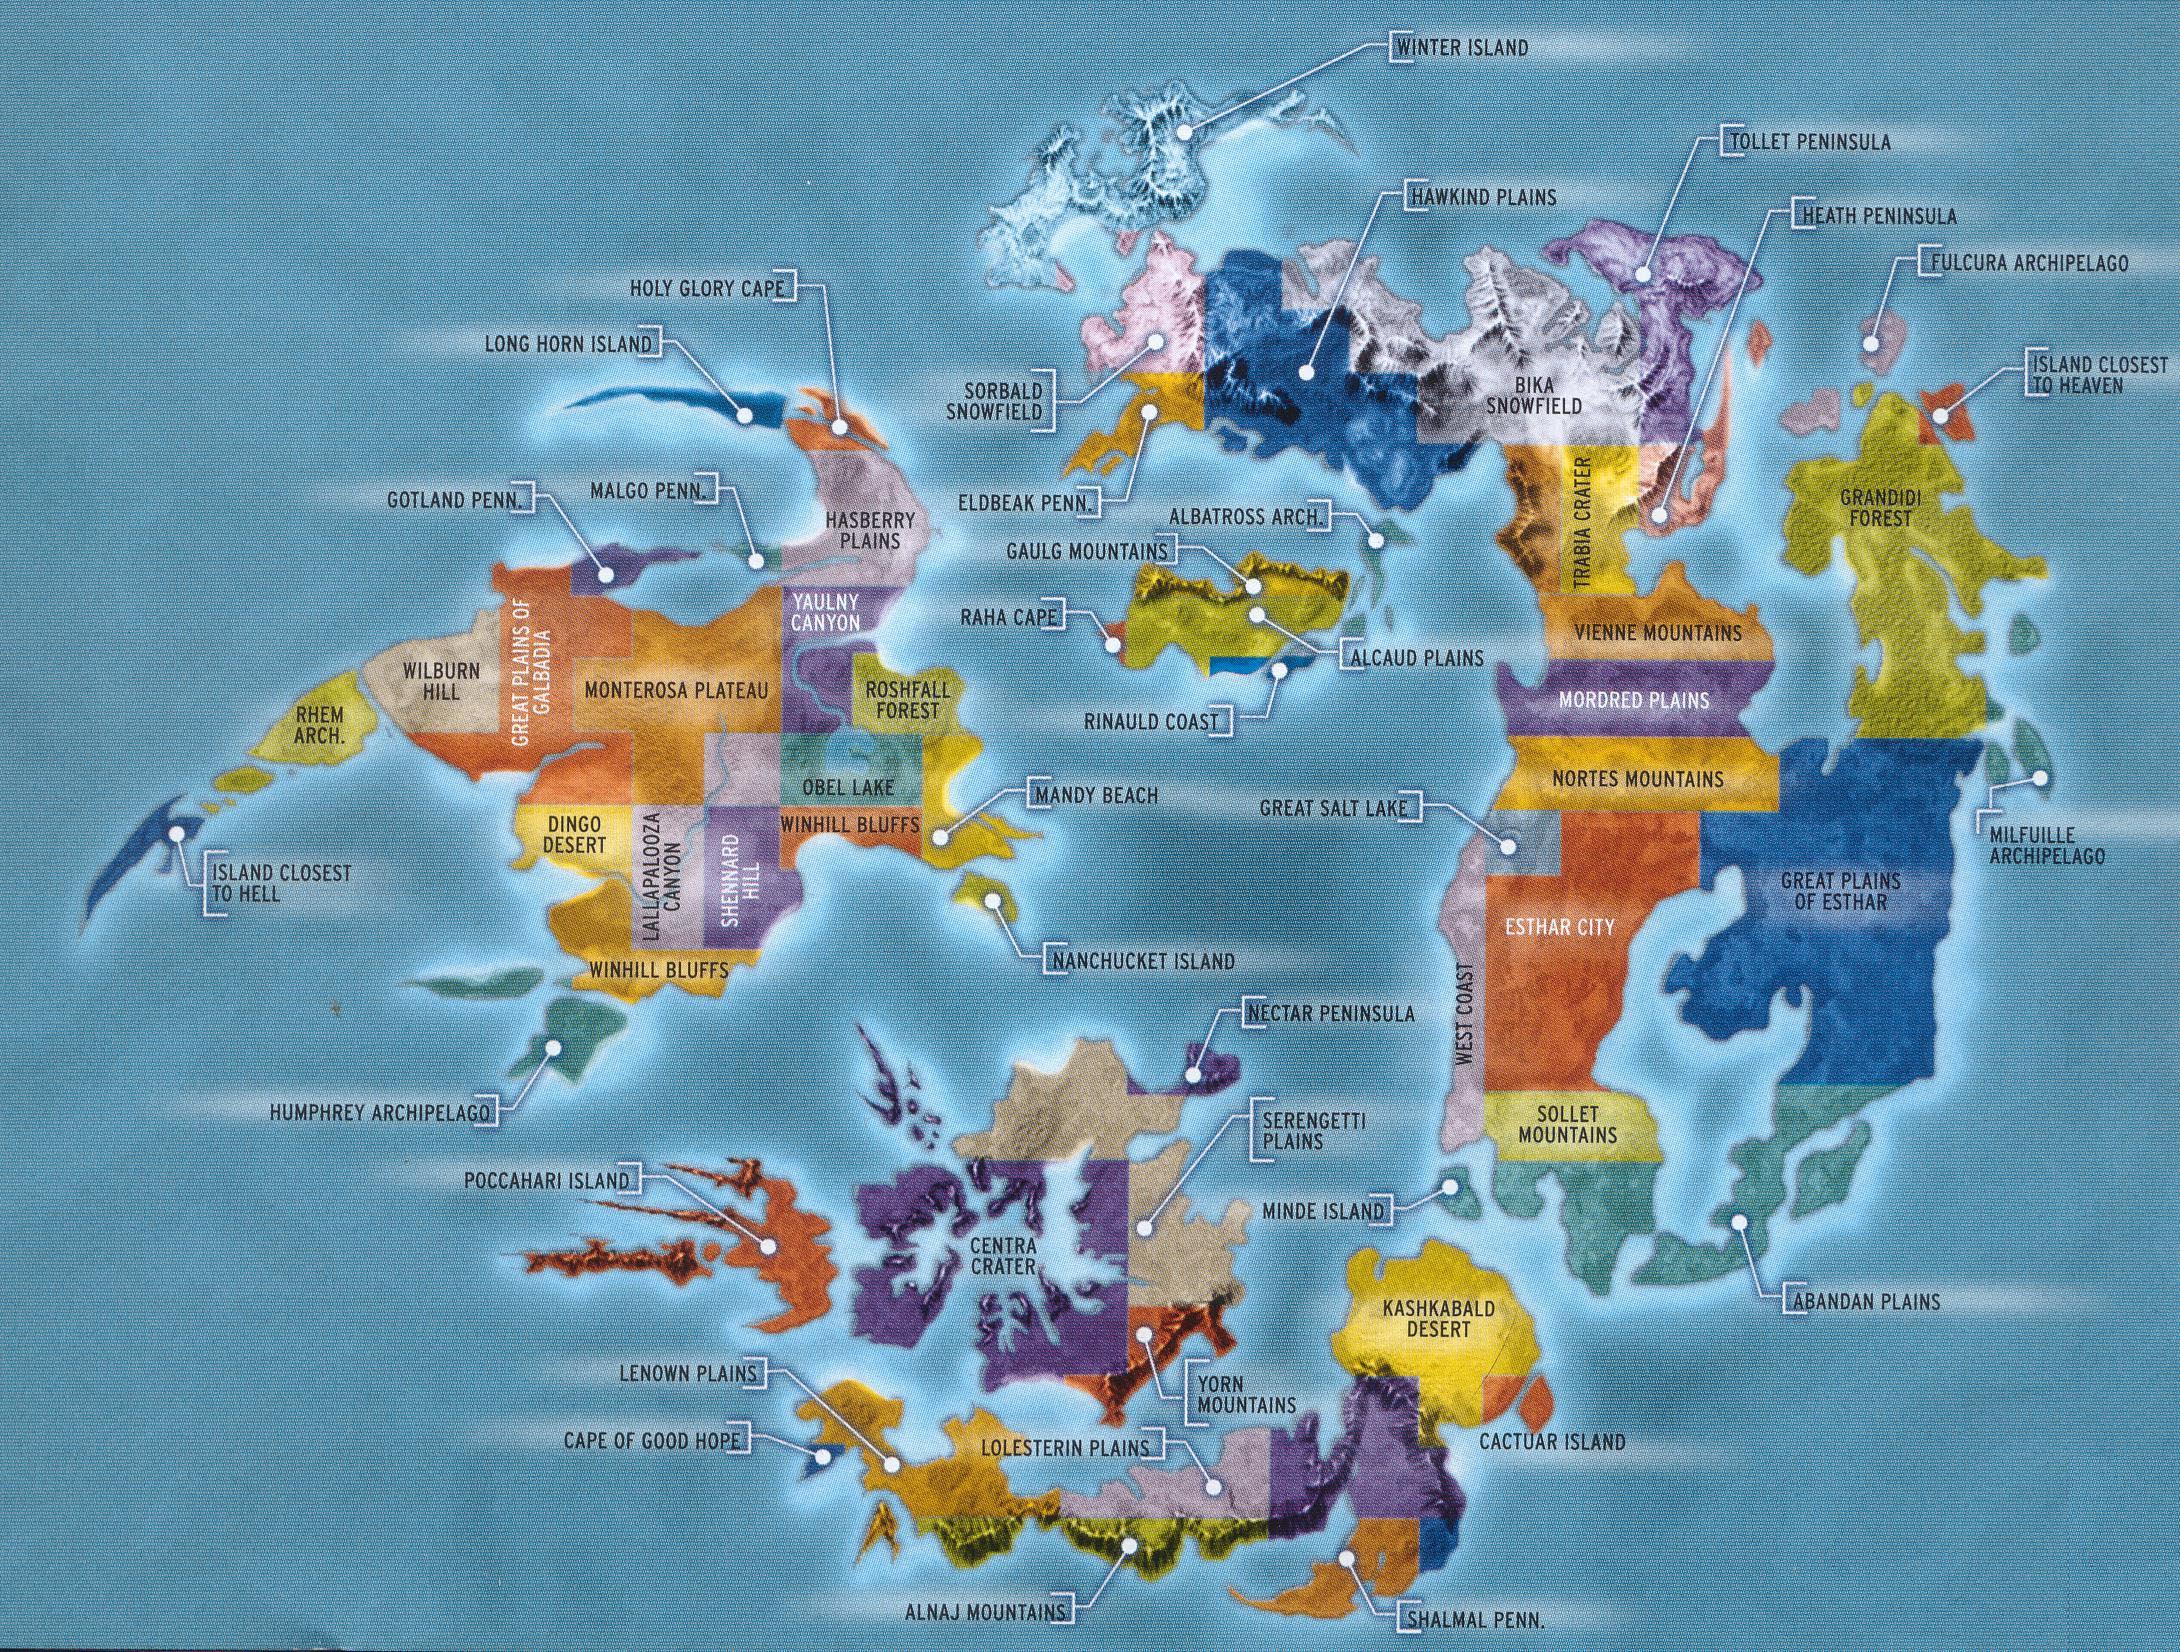 Galbadia Continent Final Fantasy Wiki FANDOM powered by Wikia